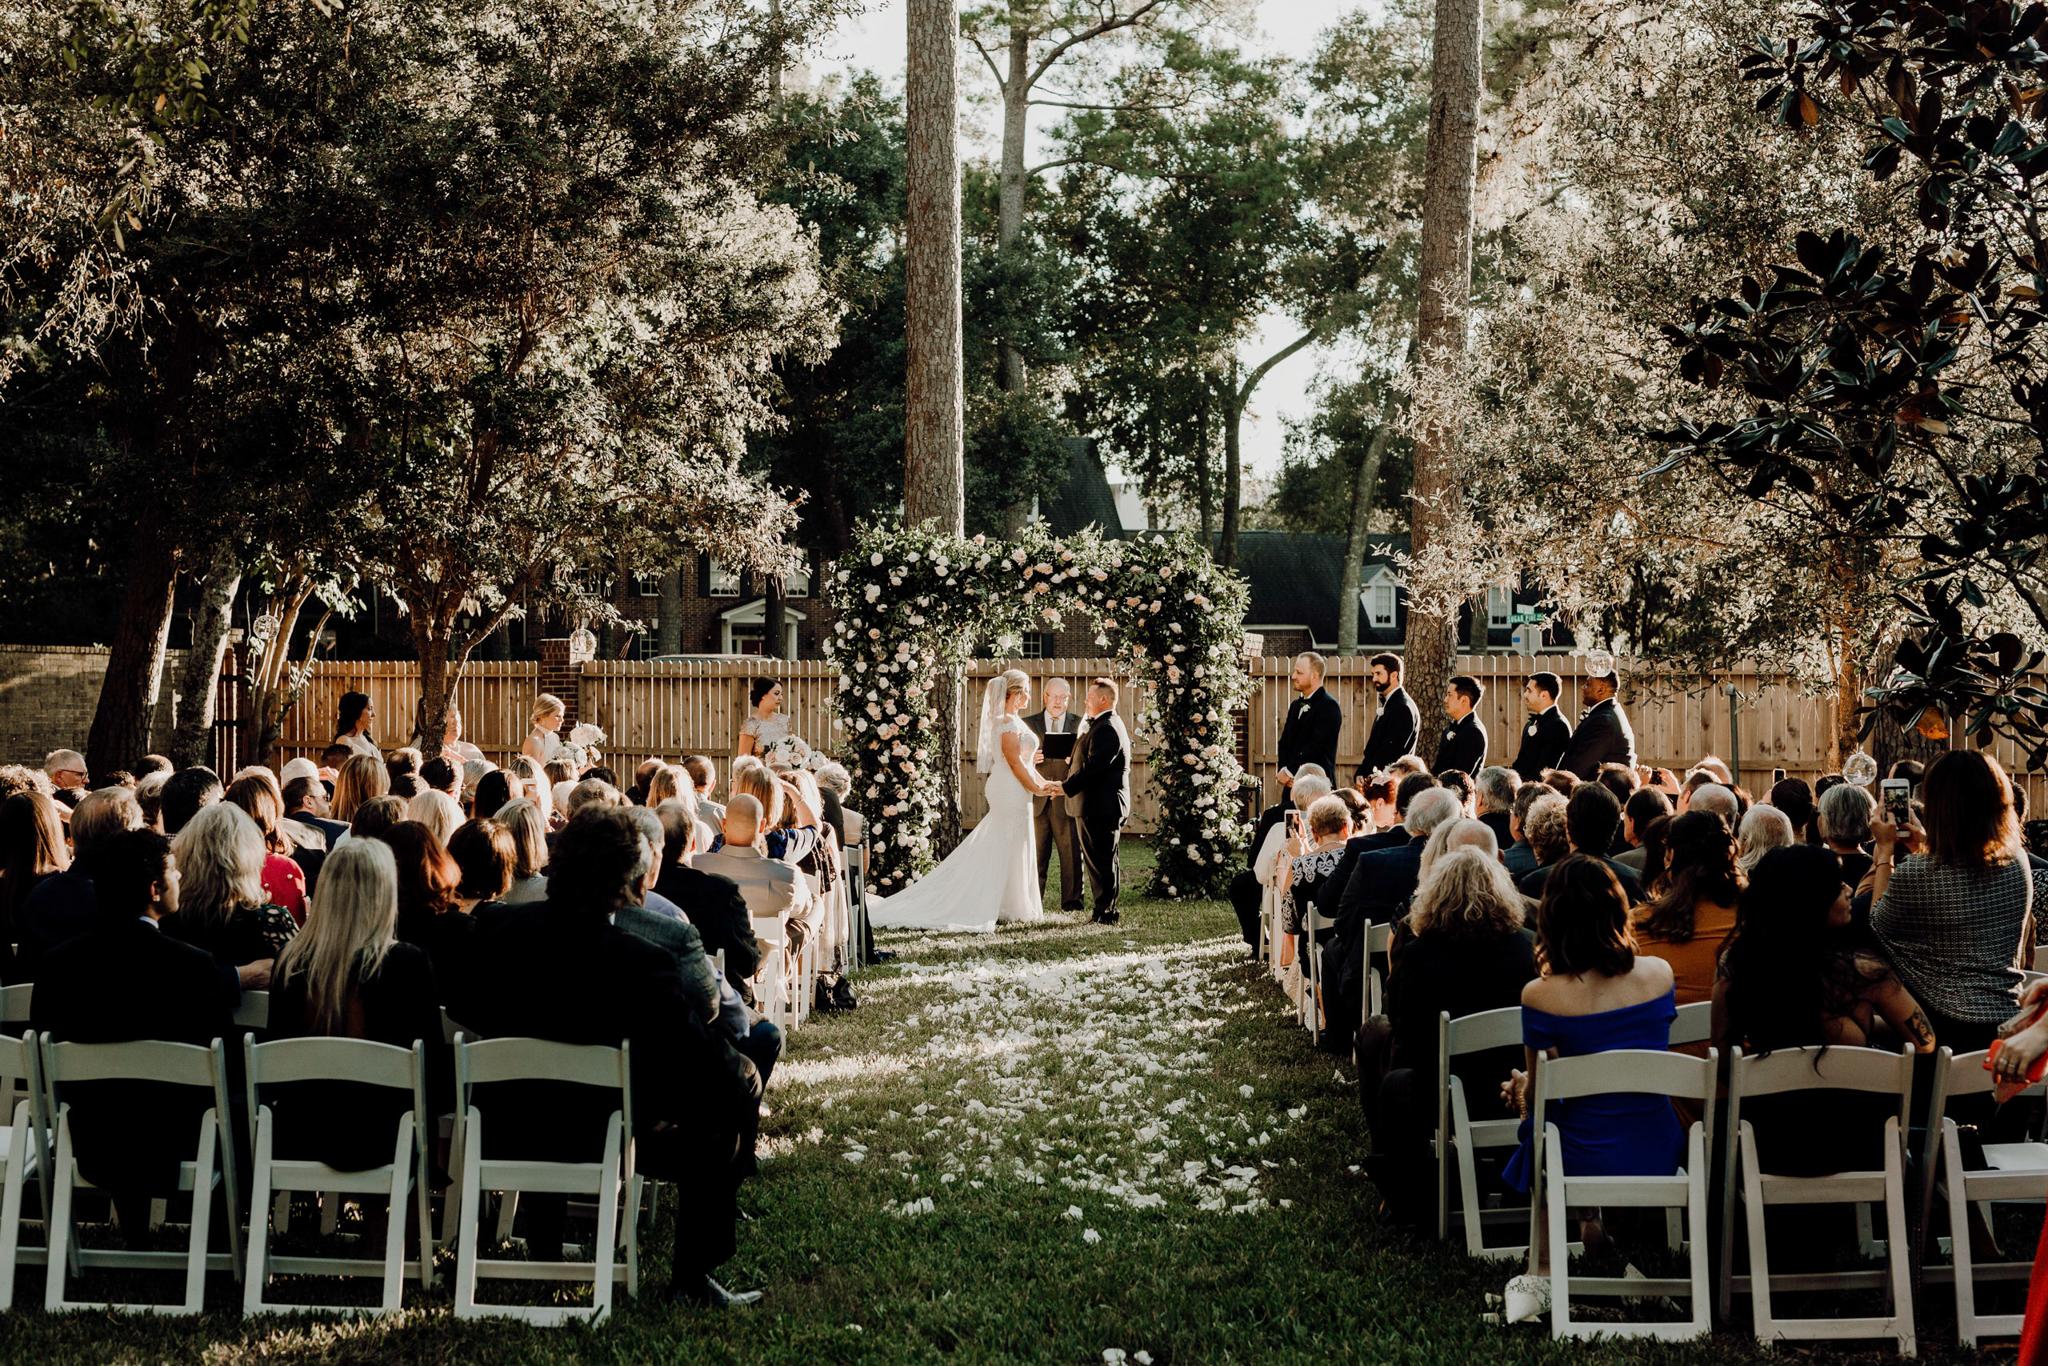 Houston Wedding Photographer-Intimate Texas Backyard Wedding- Houston Wedding Photographer -Kristen Giles Photography-44.jpg